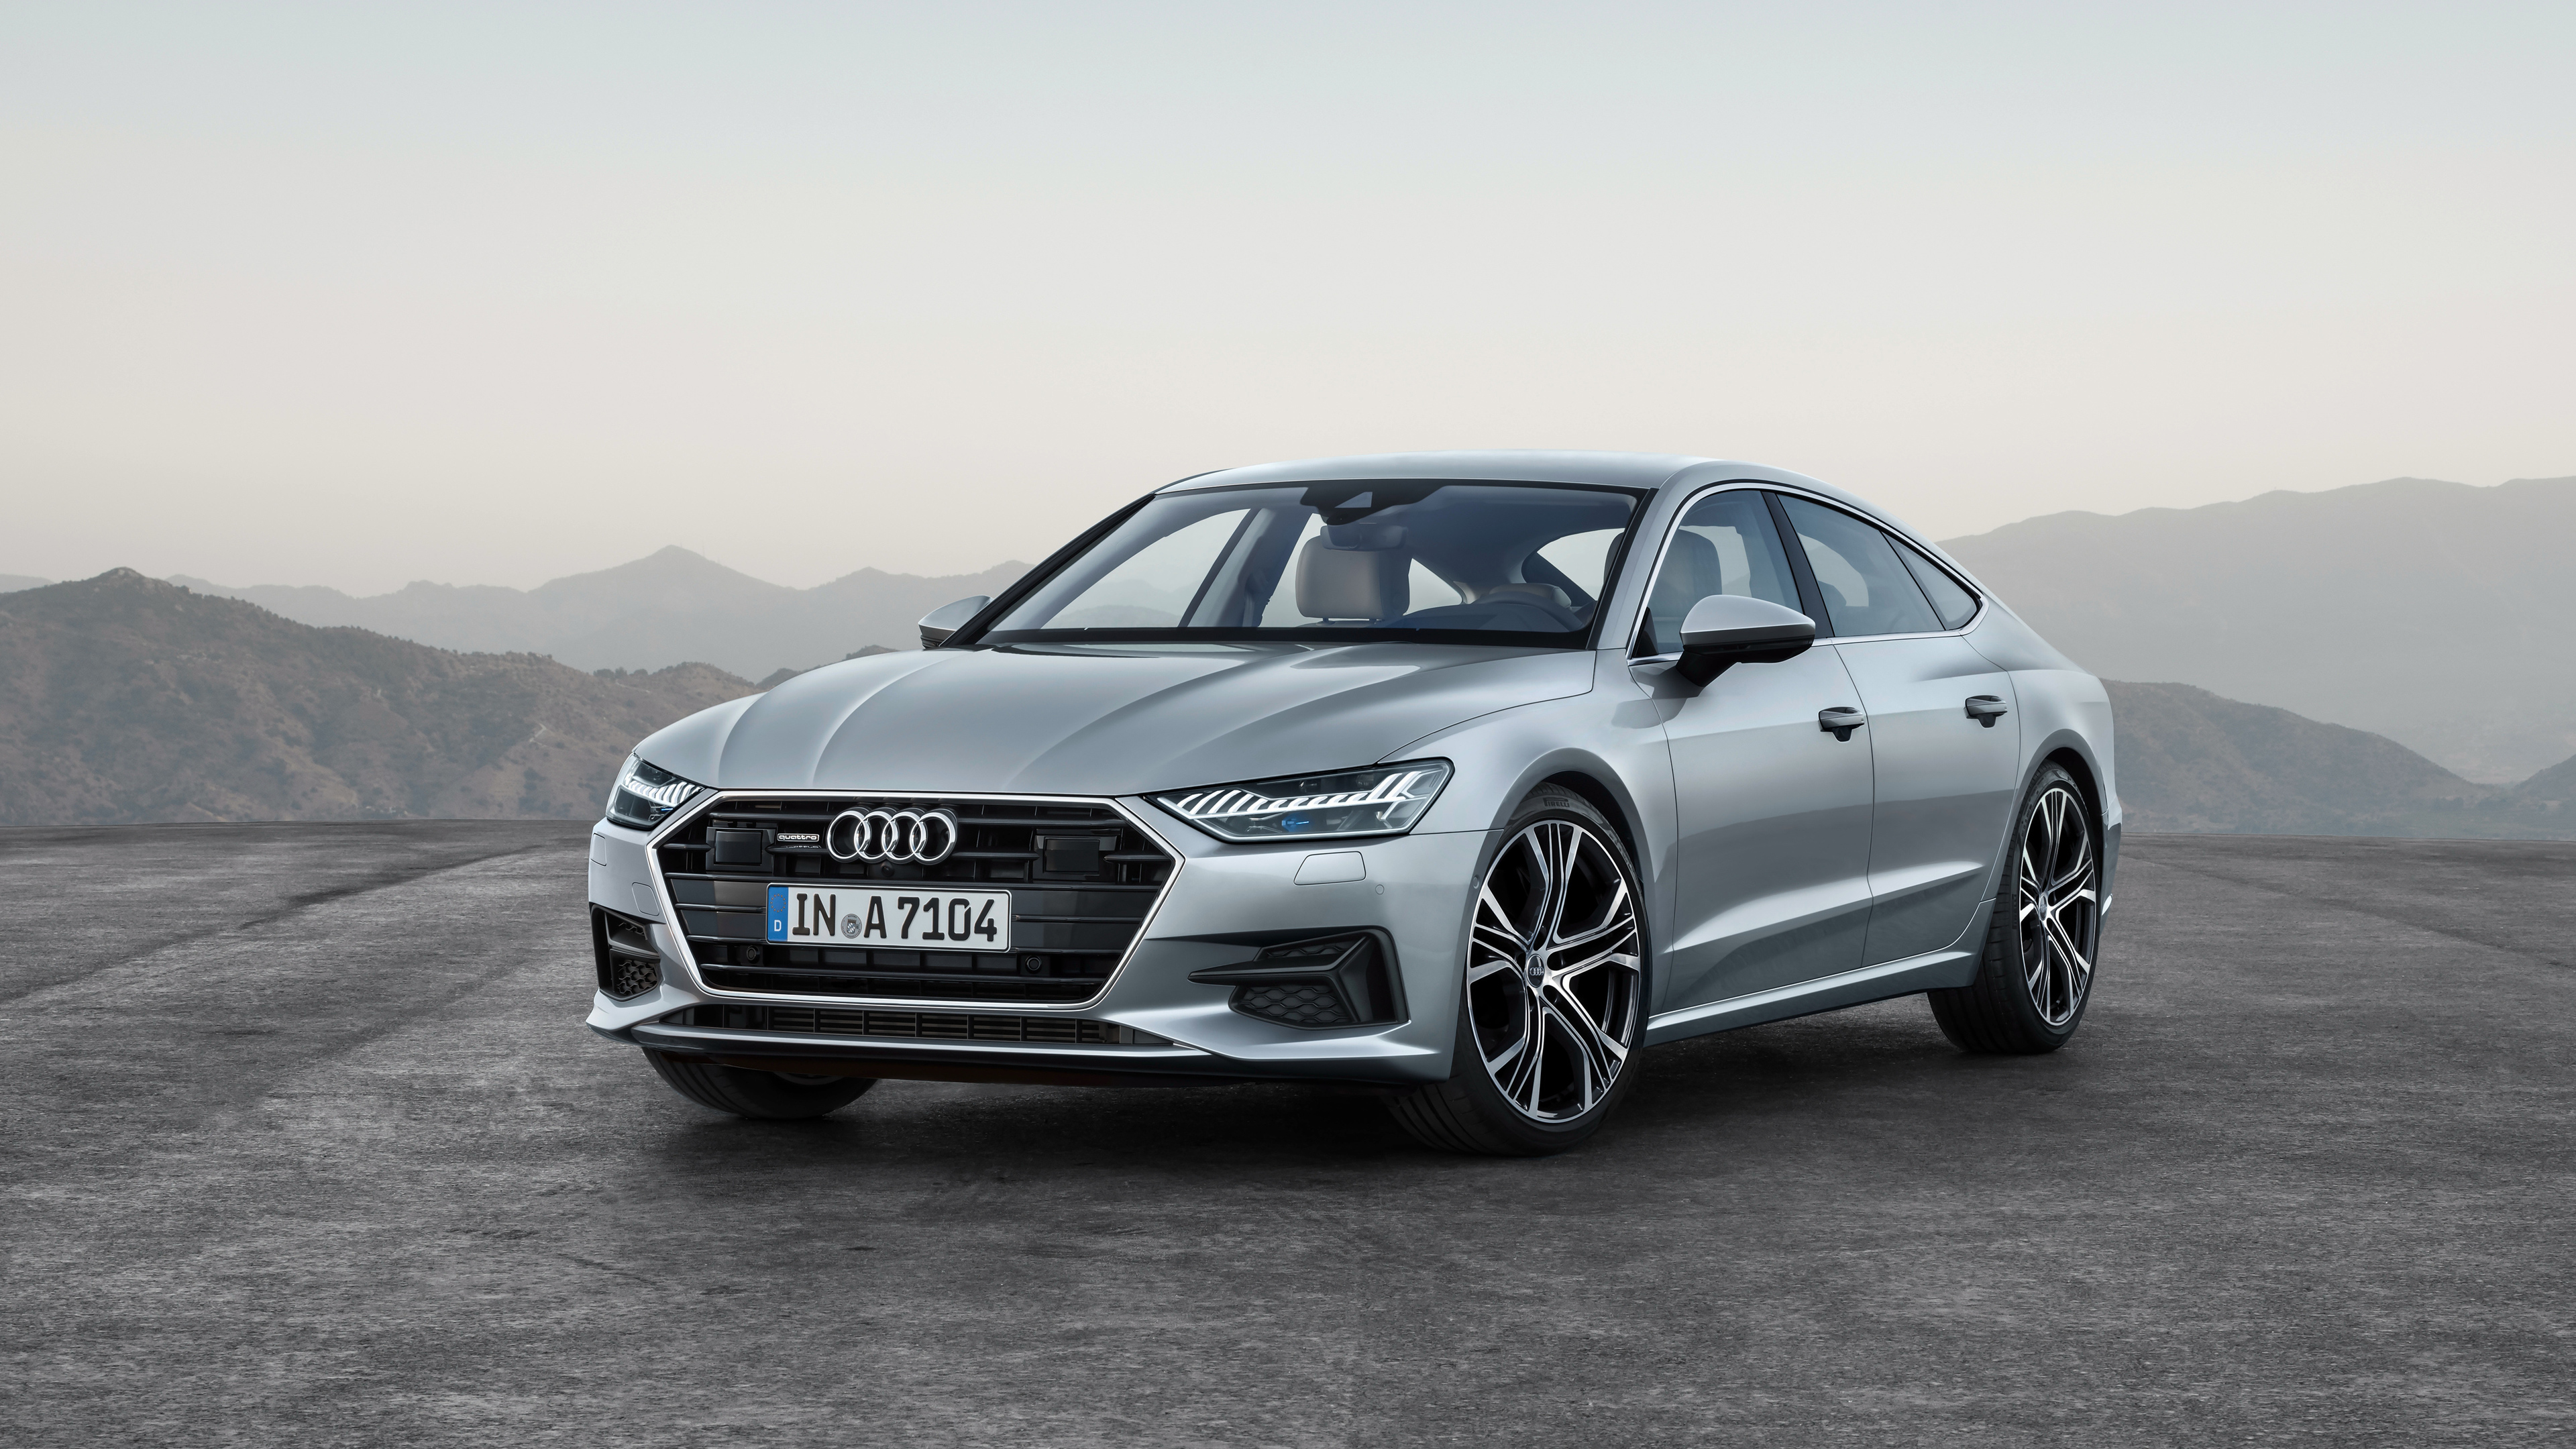 2018 Audi A7 Sportback Quattro 4k Wallpapers Hd Wallpapers